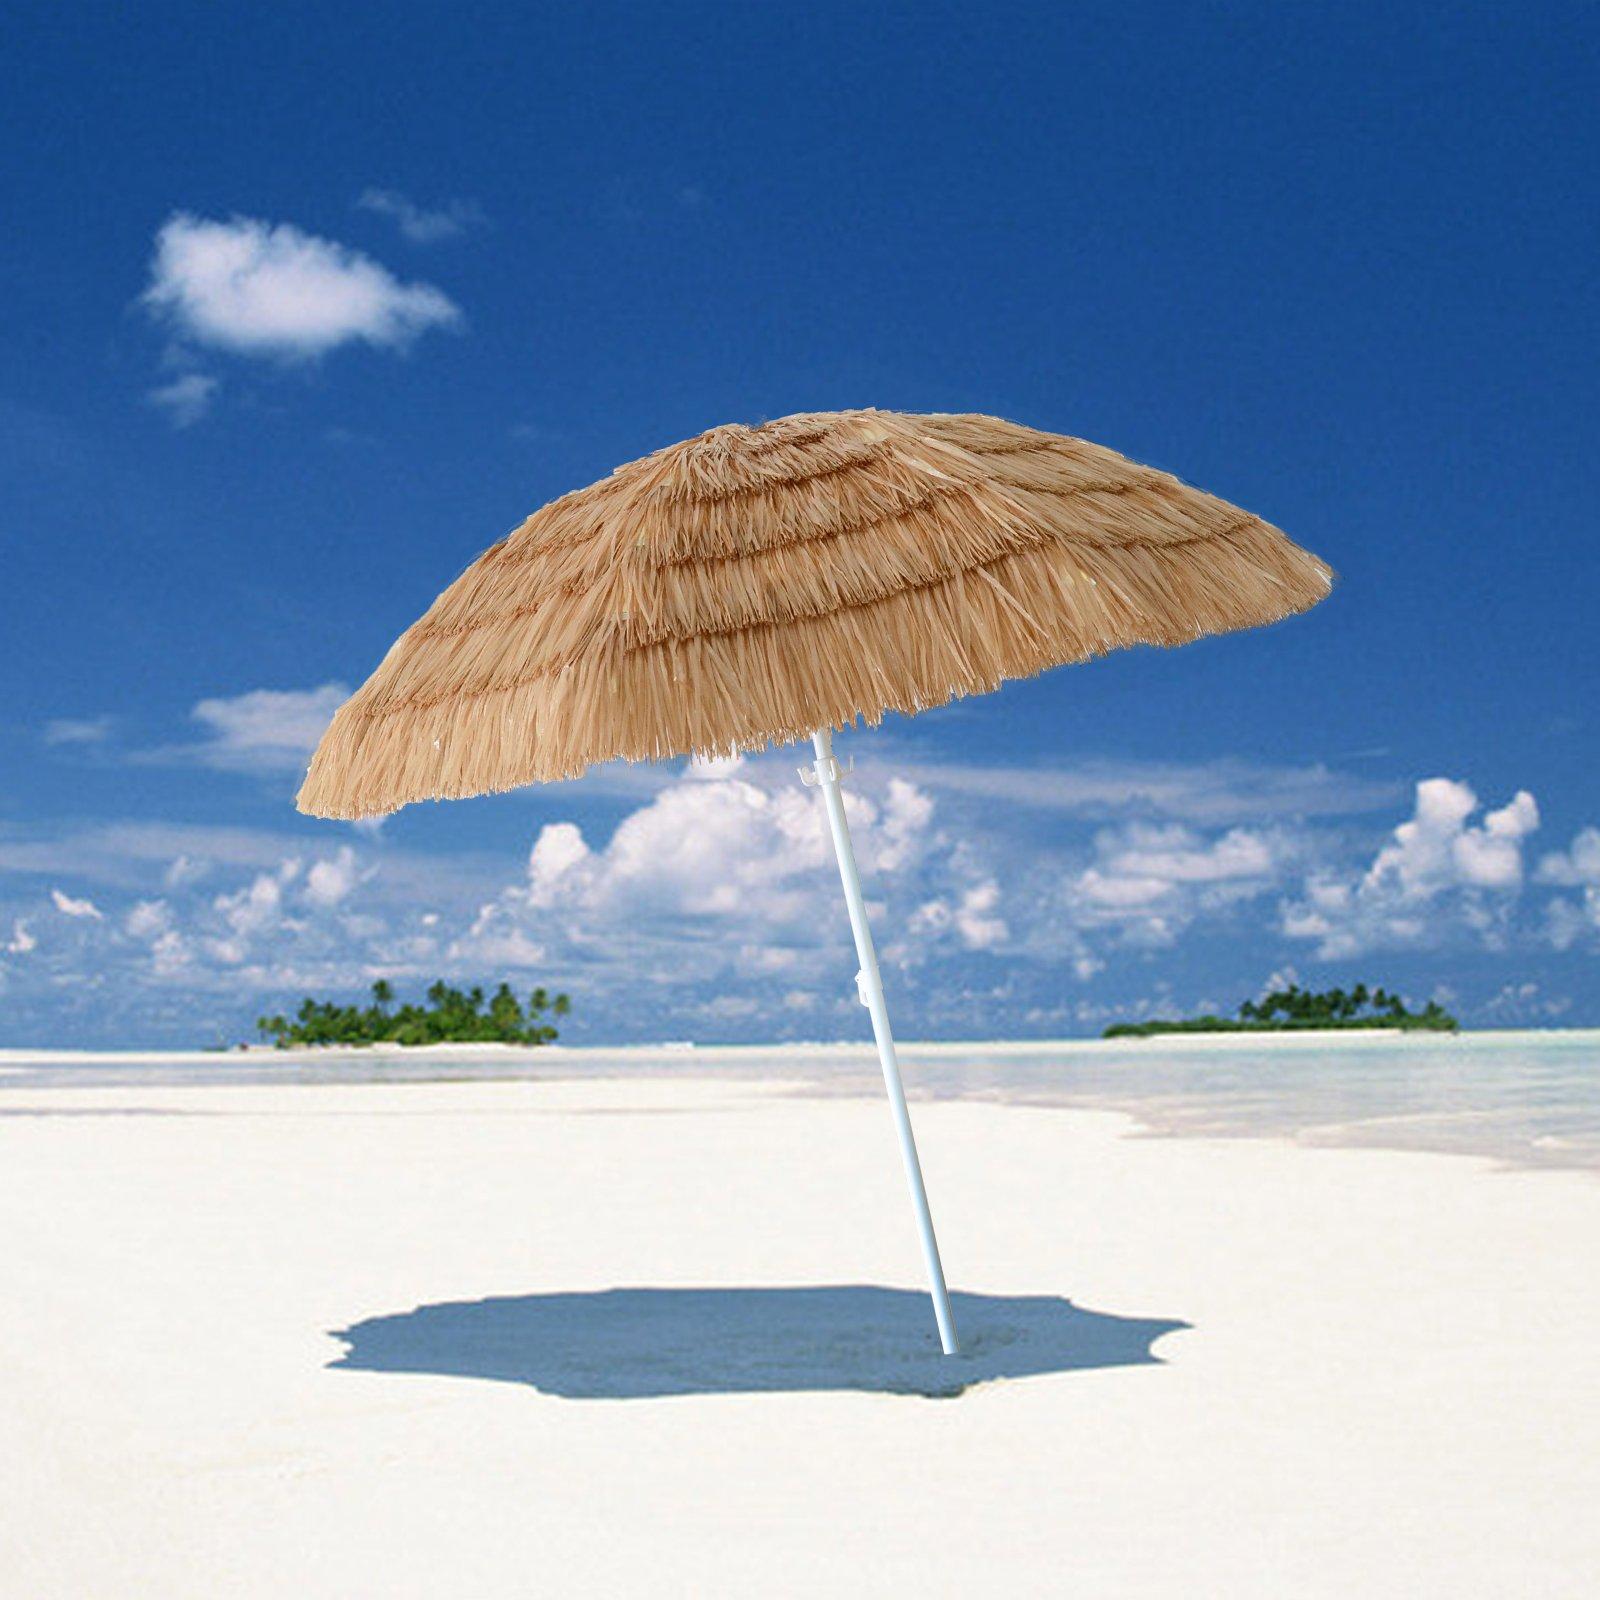 CASUN GARDEN 7' Hula Thatched Tiki Umbrella Outdoor Beach Umbrella with Hanging Hook, Natural Color